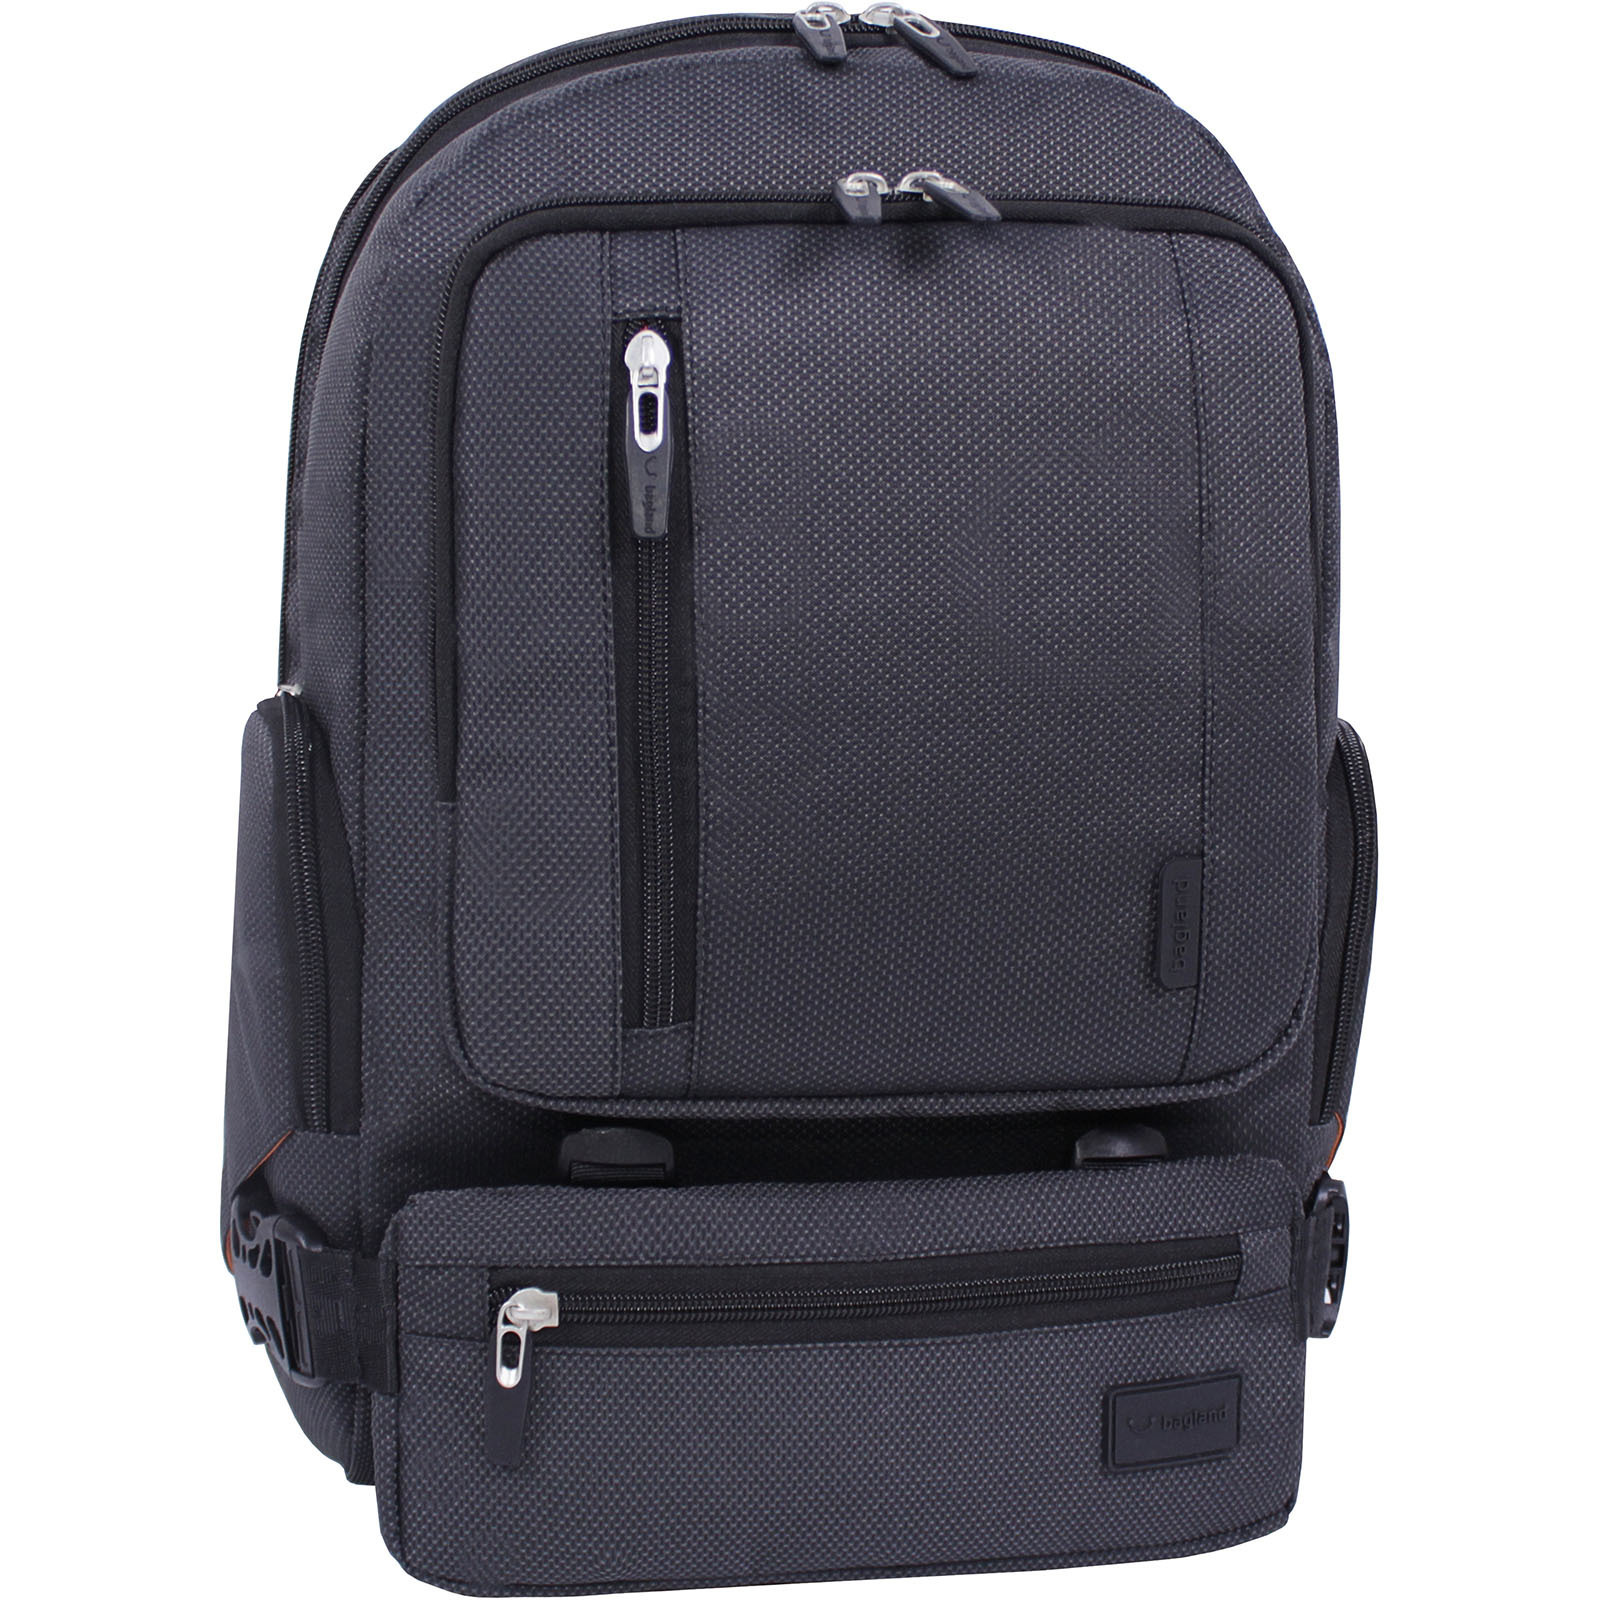 Мужские рюкзаки Рюкзак Bagland Frank 26 л. черный (00595169) IMG_0511.jpg